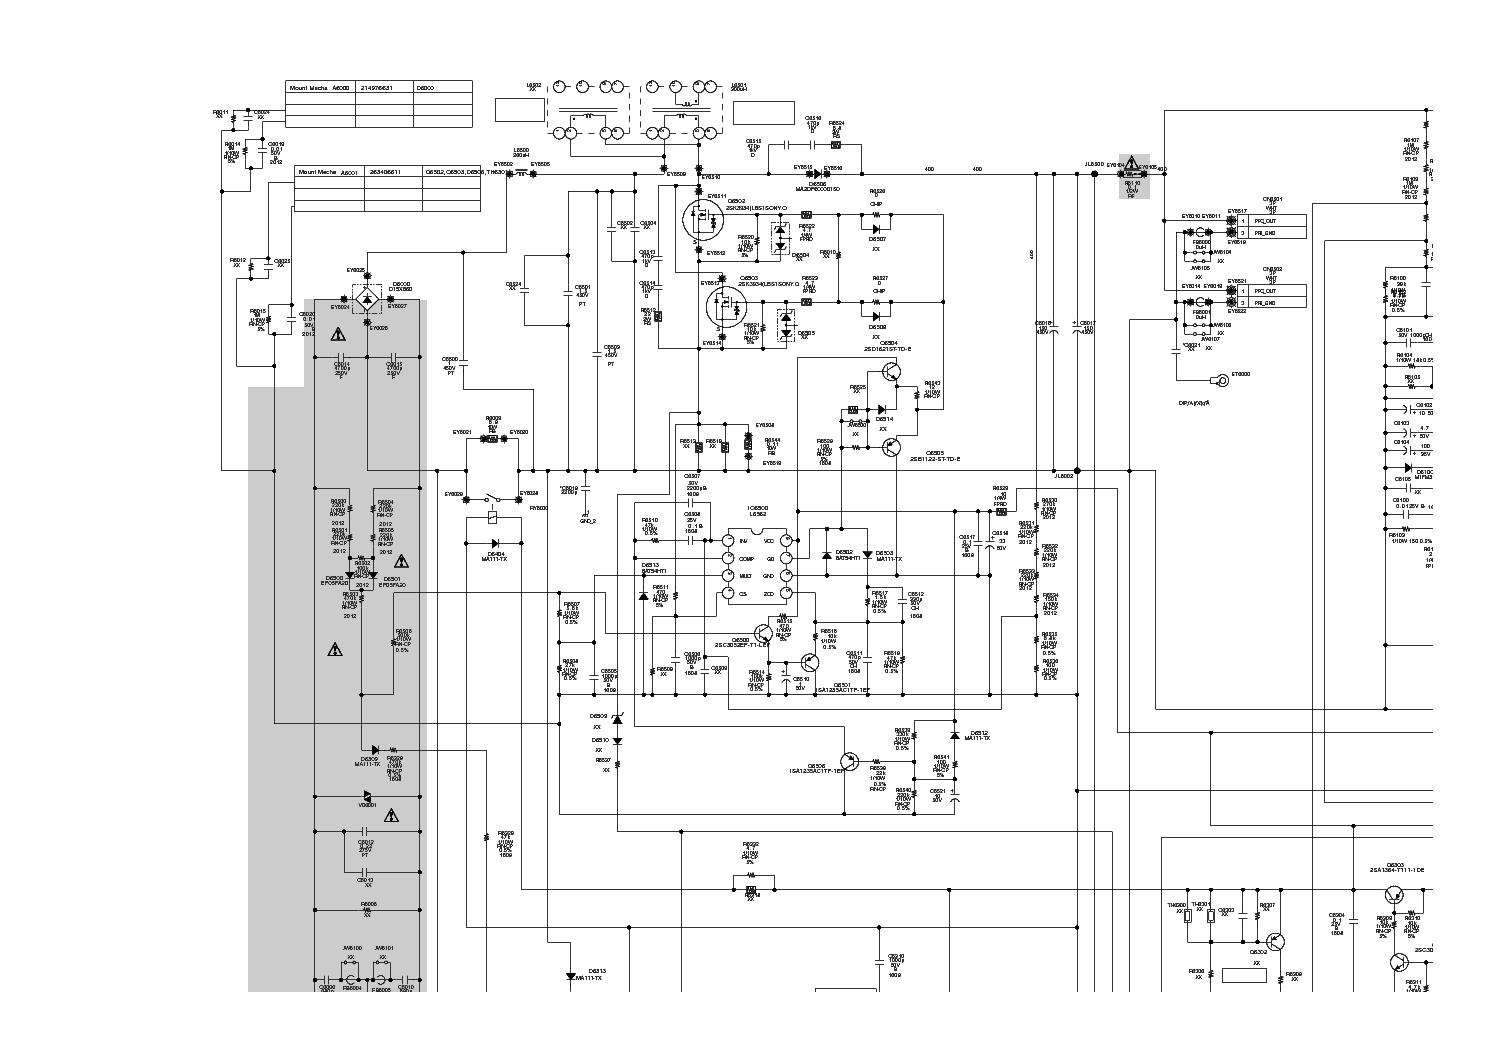 SONY GE2C 1-474-219-11 CXA3809M-T6 LV5768M MIP2H2 SCH